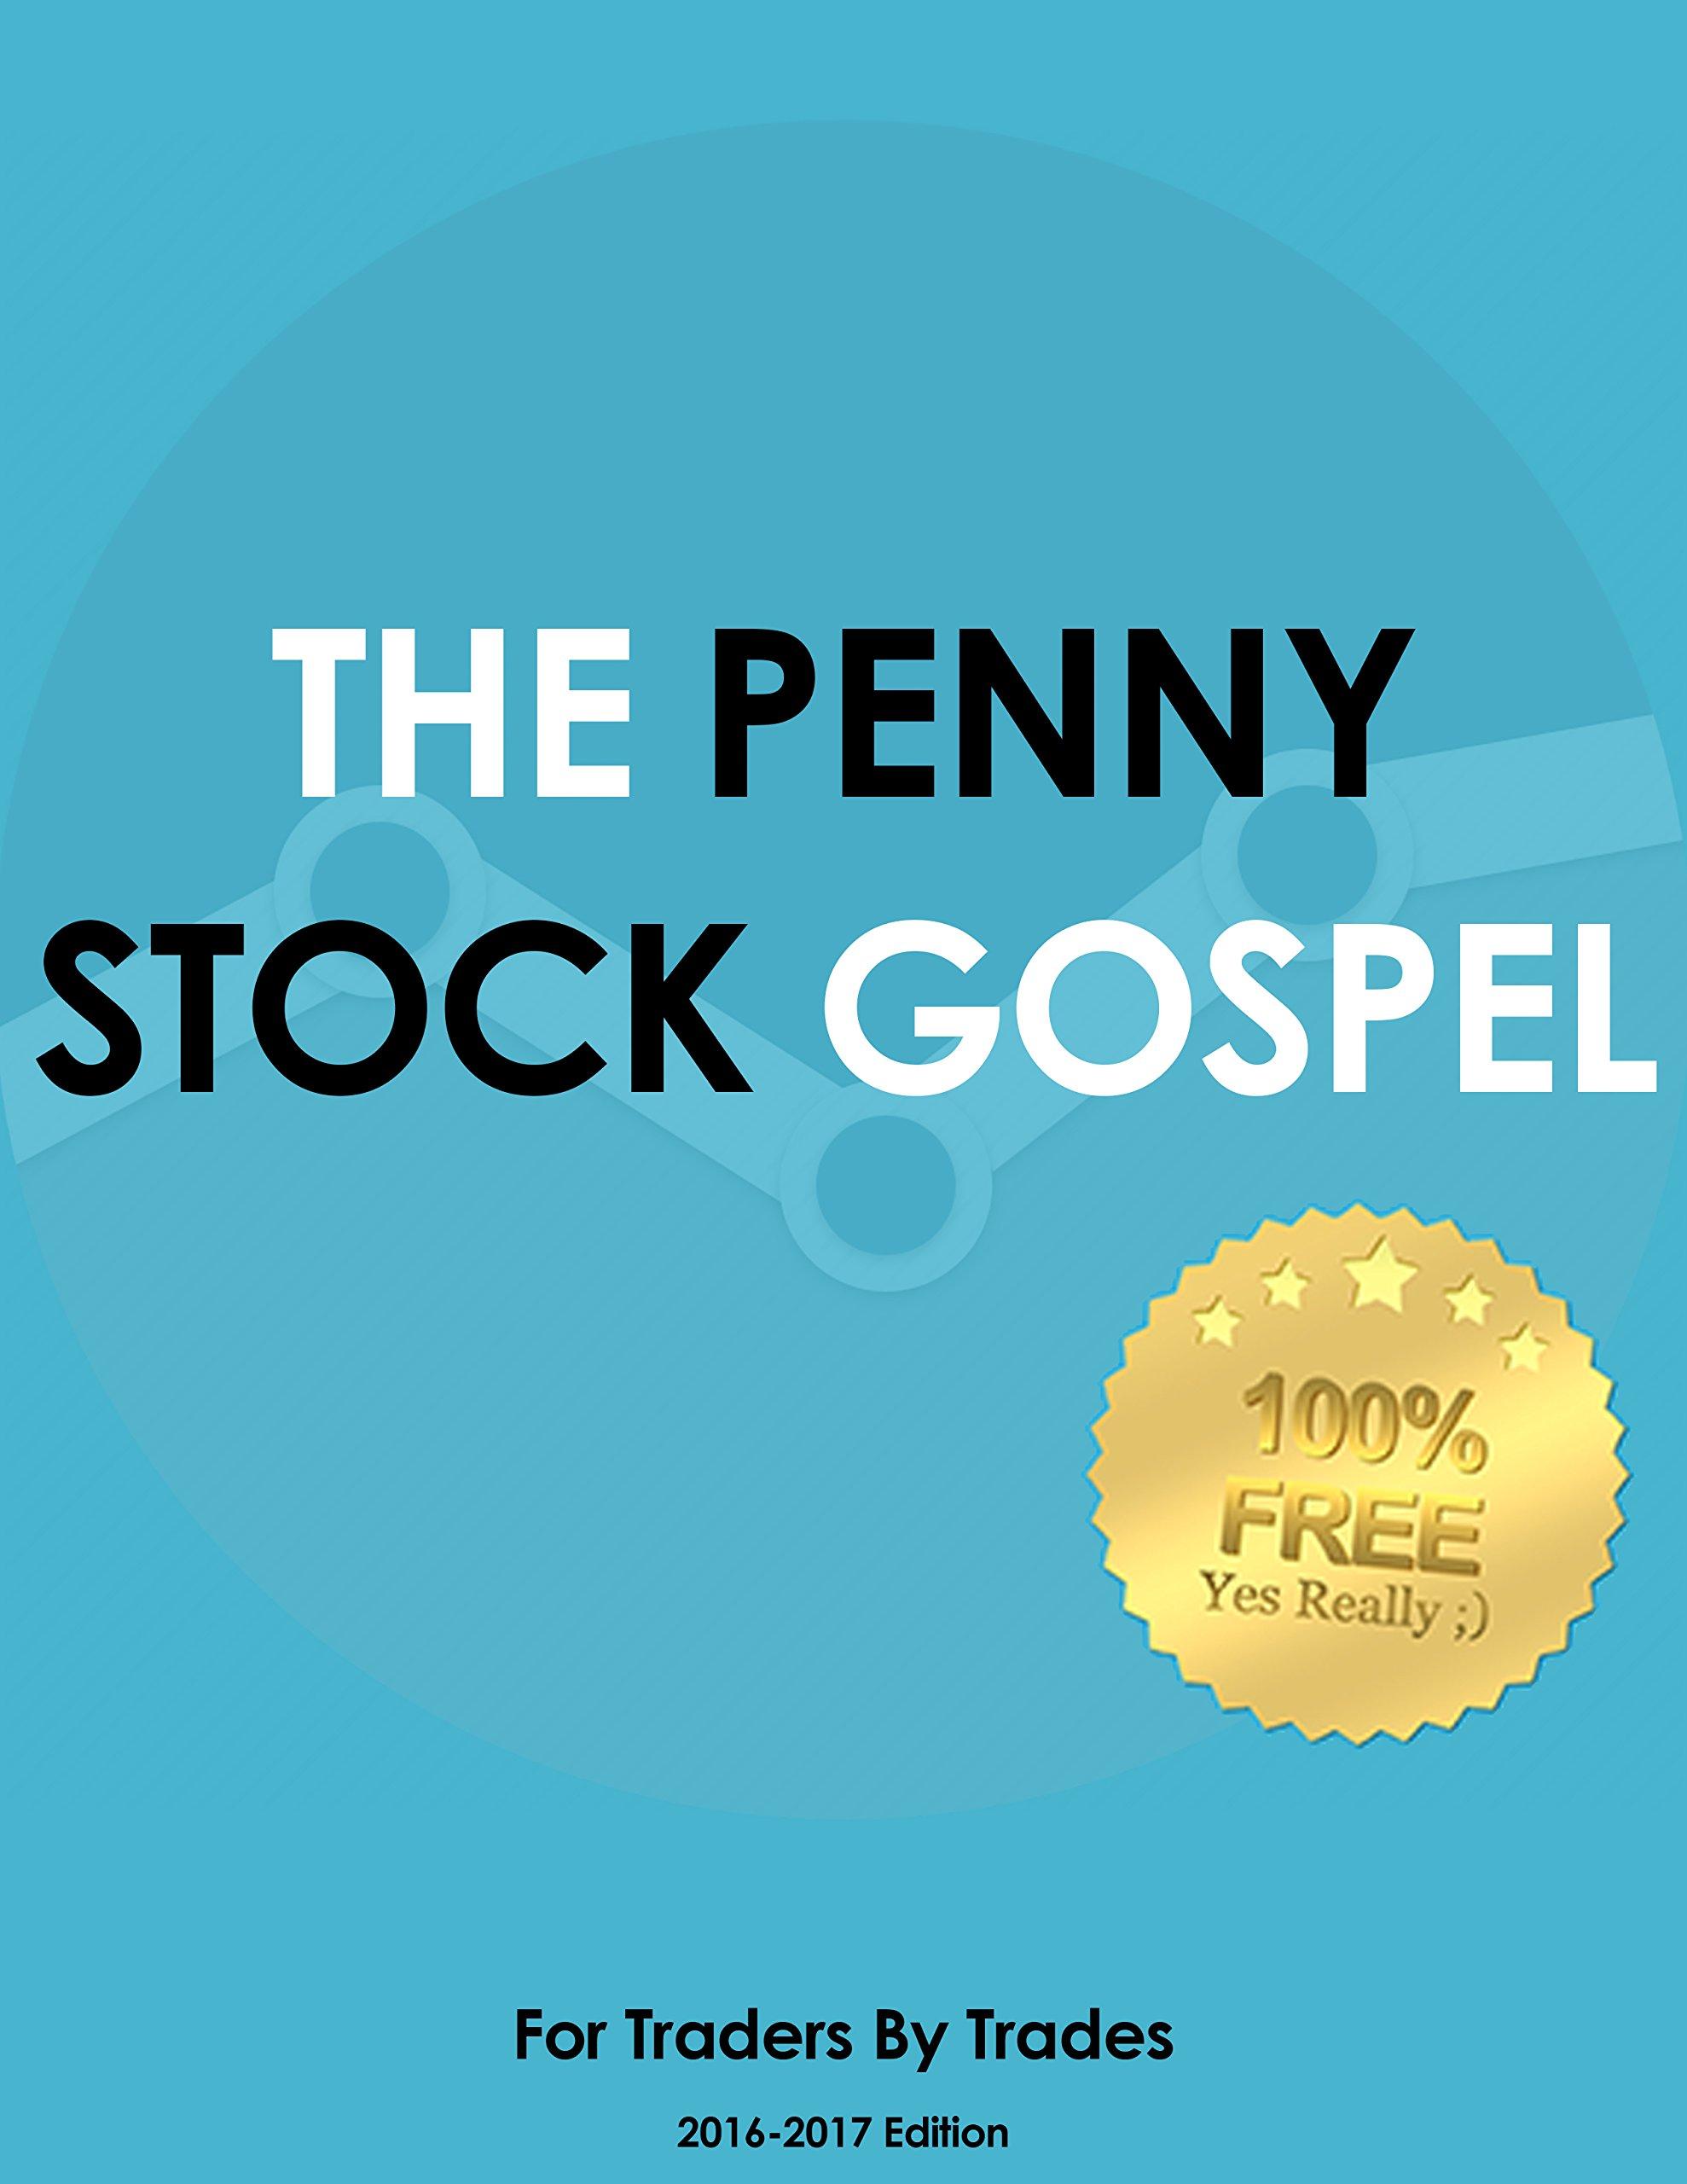 The Penny Stock Gospel